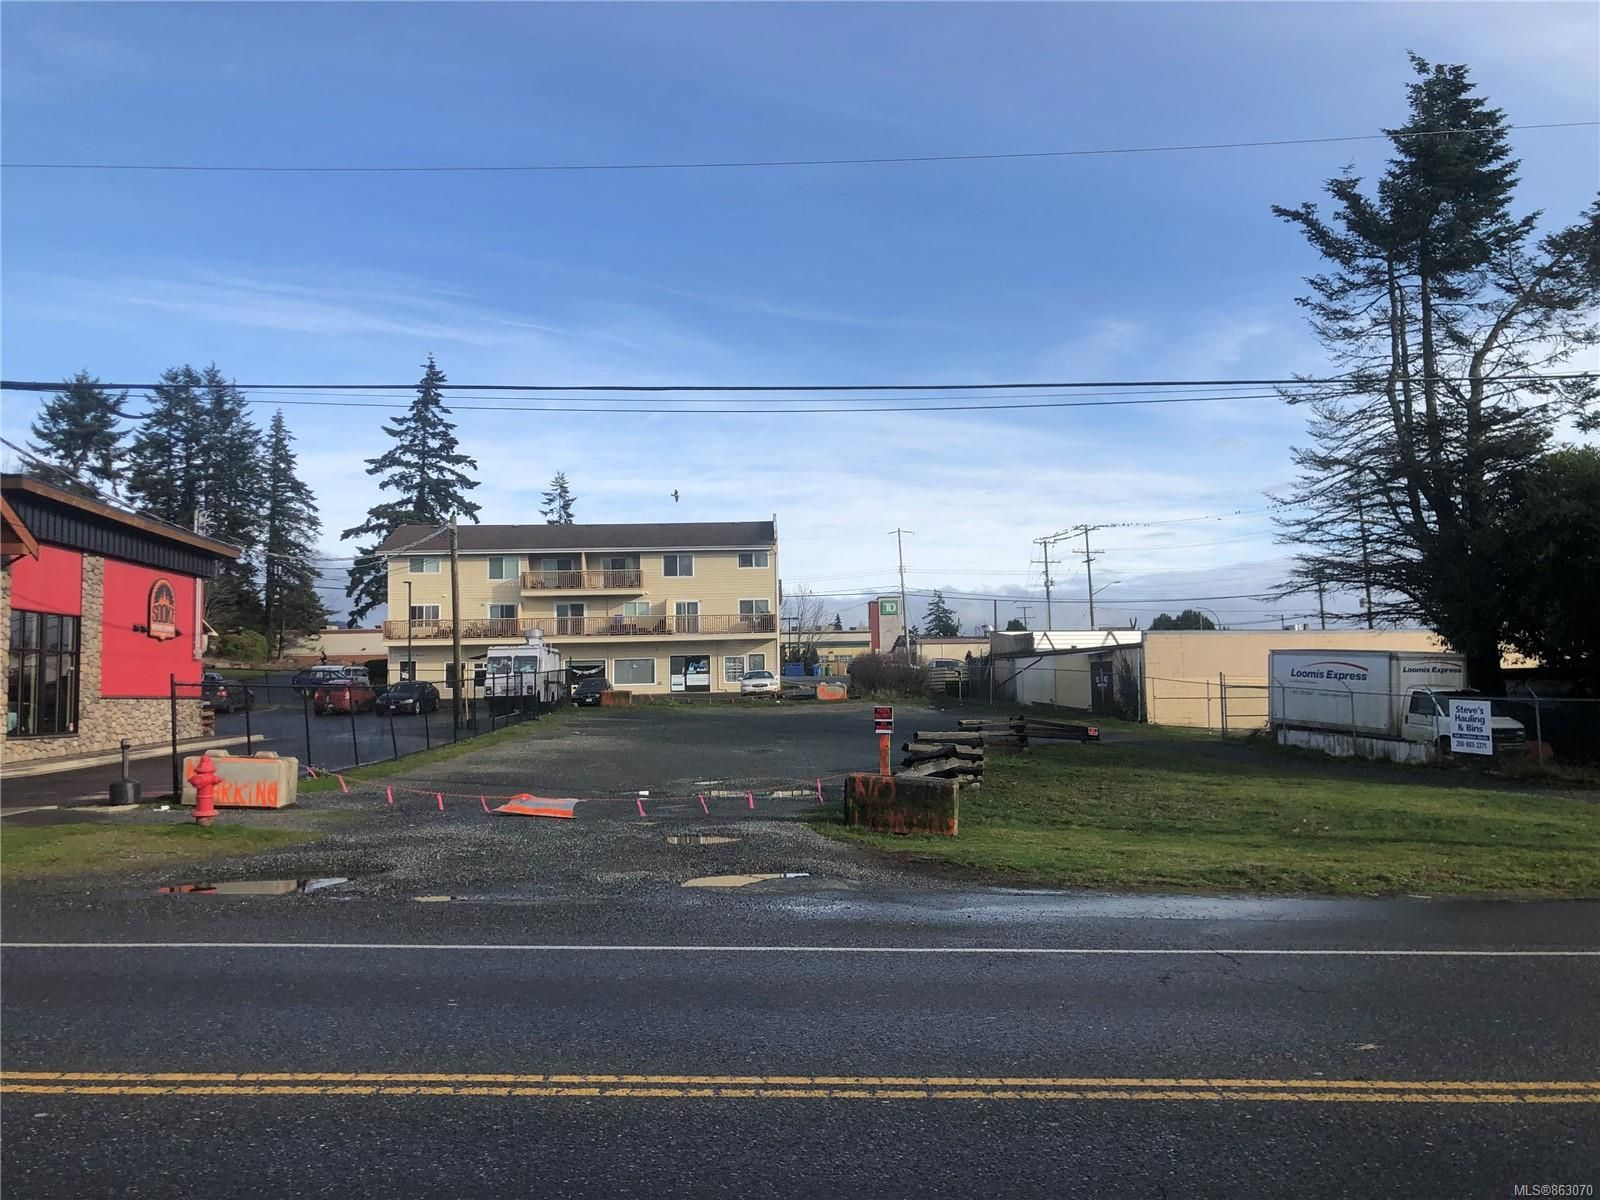 Main Photo: 2051 Otter Point Rd in : Sk Sooke Vill Core Land for sale (Sooke)  : MLS®# 863070